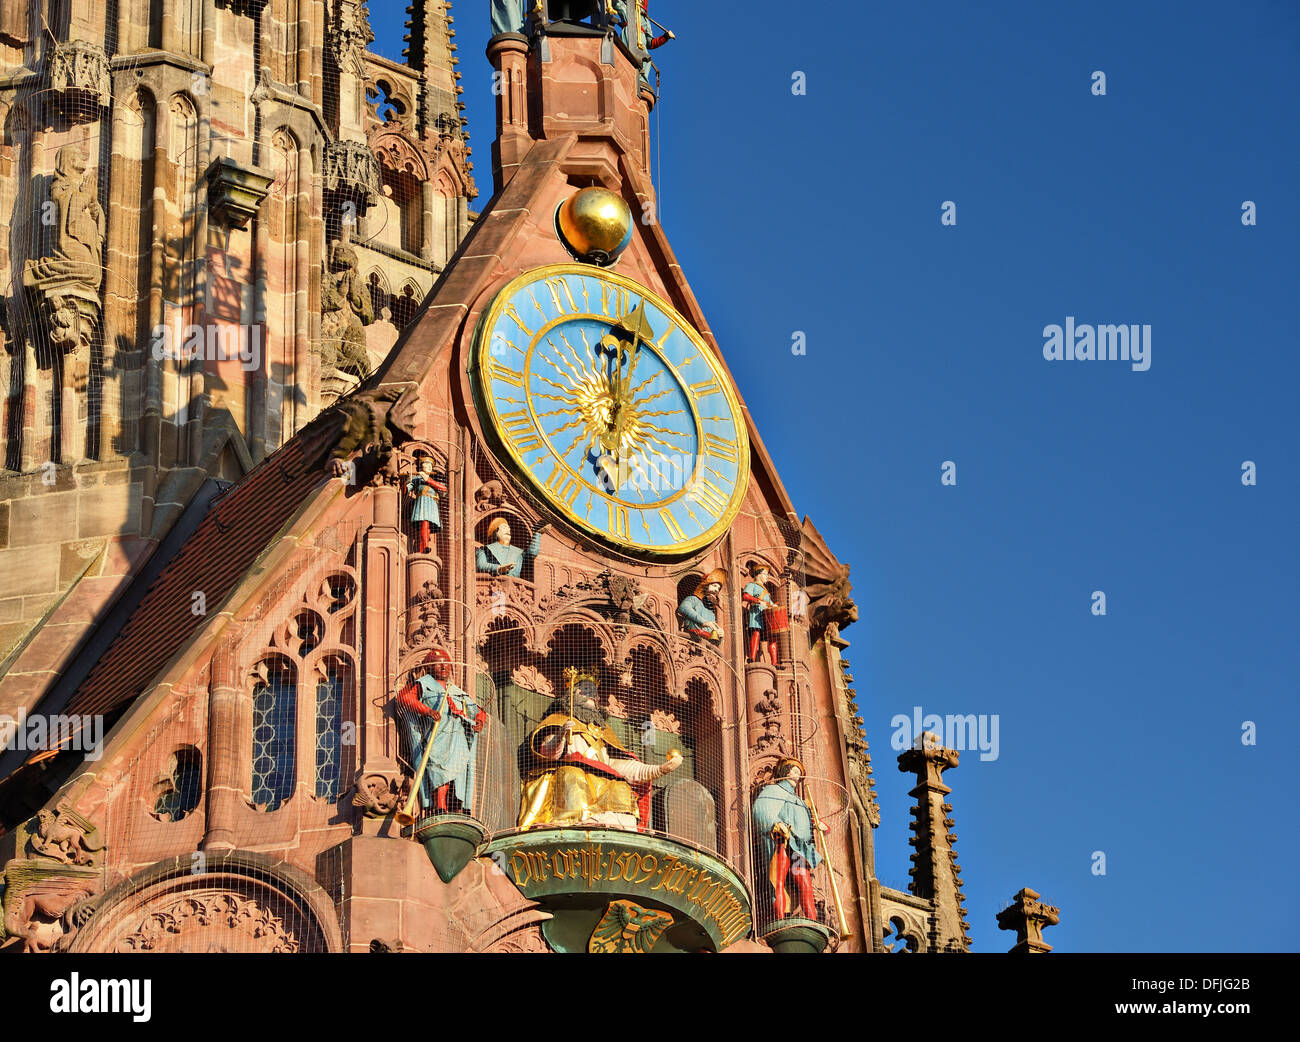 Frauenkirche in Nuremberg, Germany - Stock Image